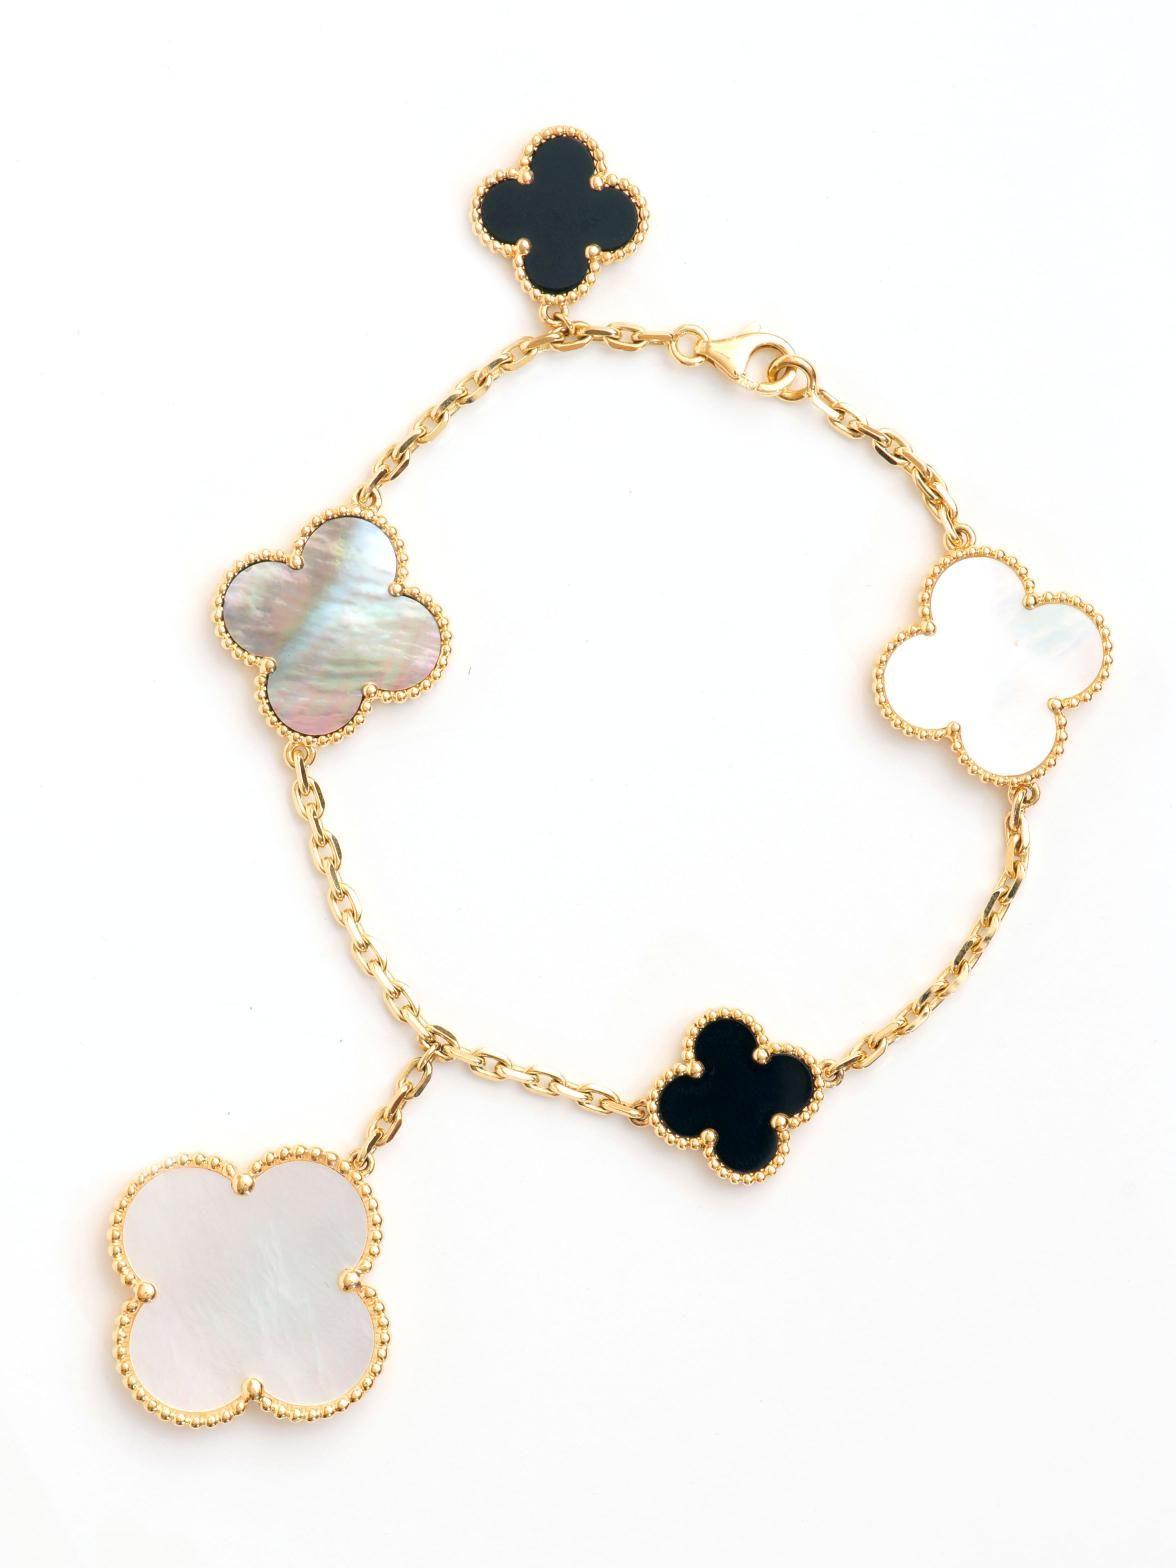 Van Cleef & Arpels 18k Onyx And Mother Of Pearl Magic Motif Bracelet  Yellow Gold